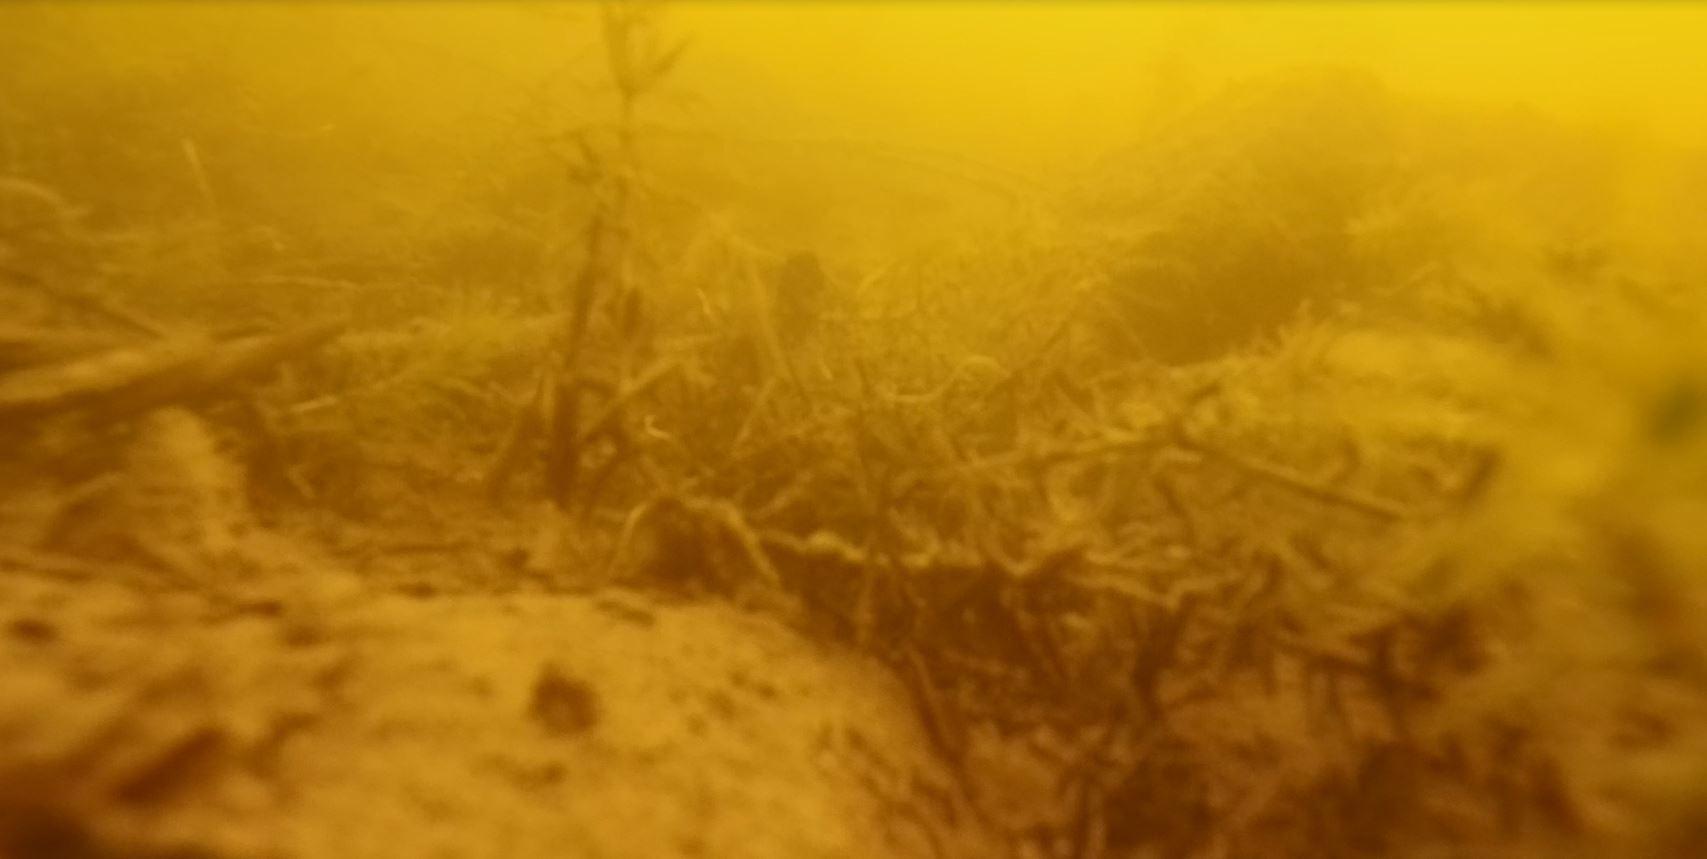 In drei Metern Tiefe sieht es so aus...